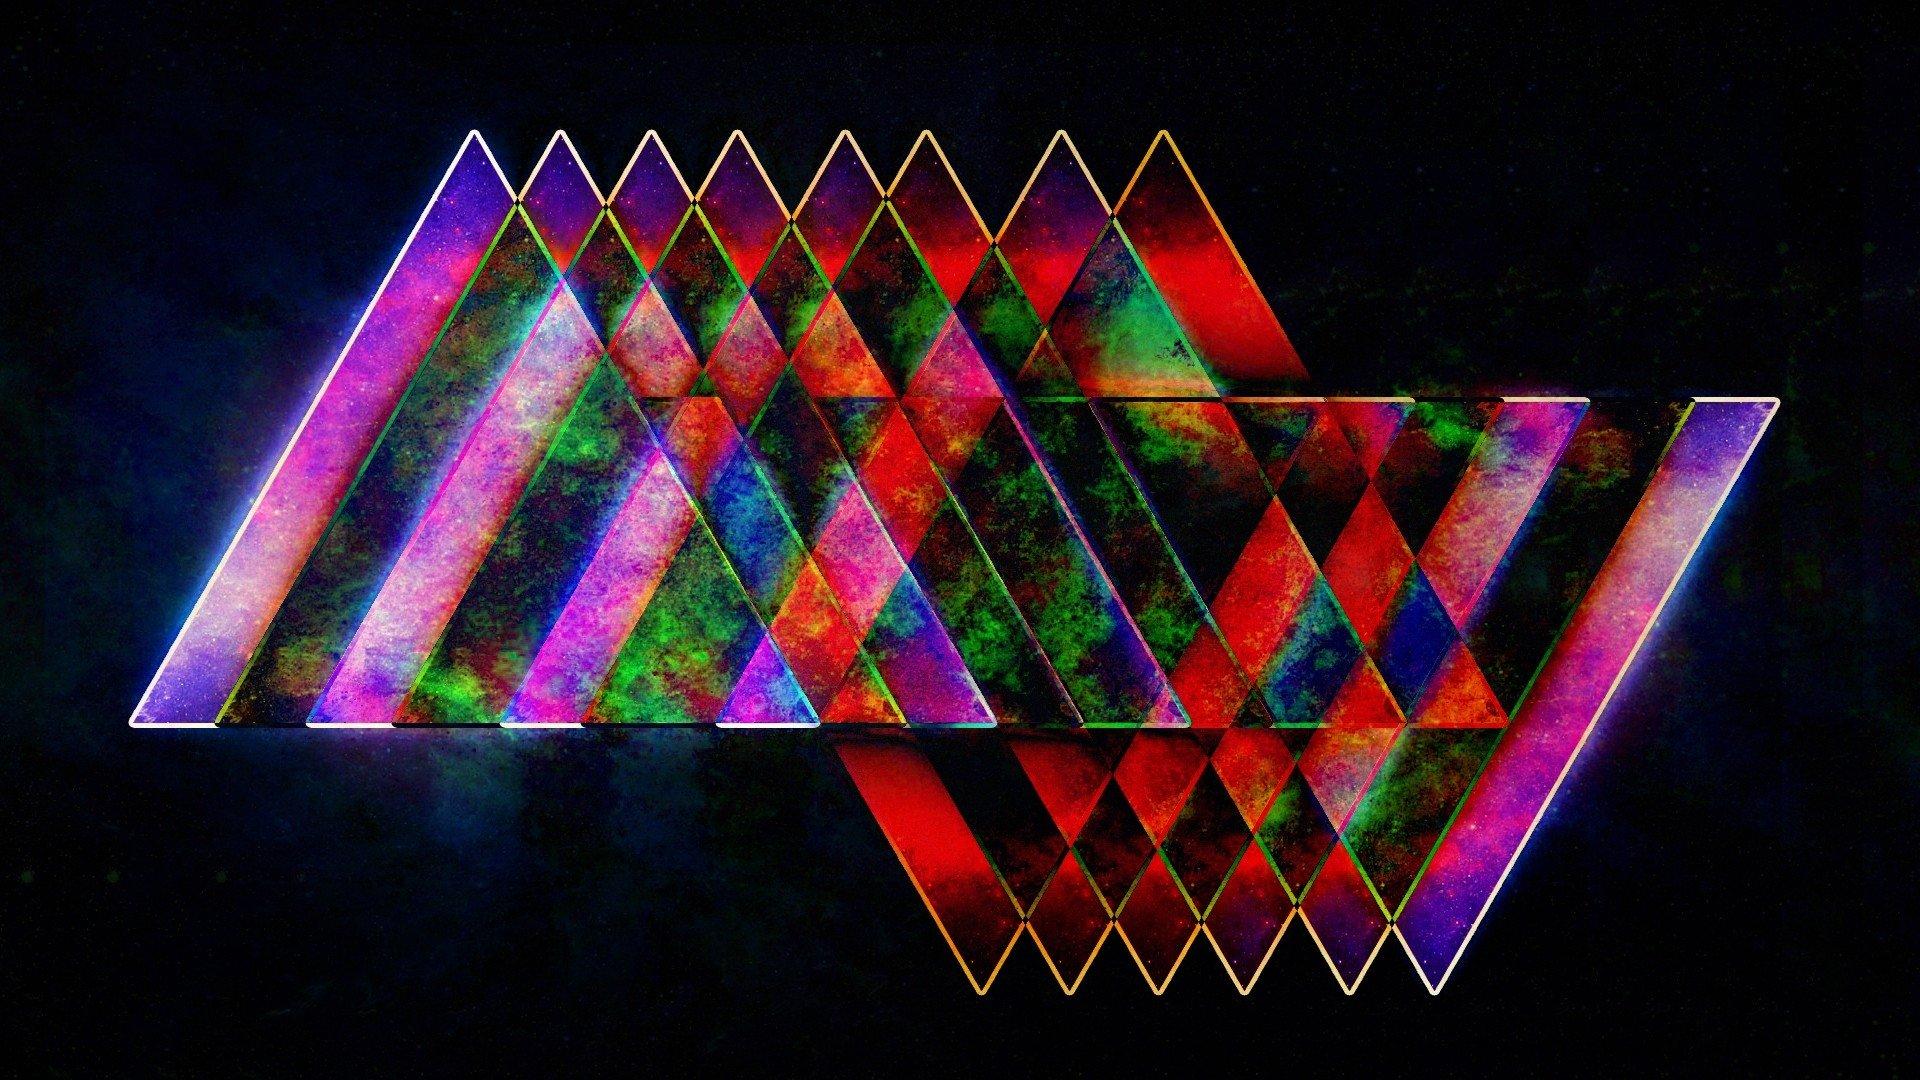 abstract wallpaper hd